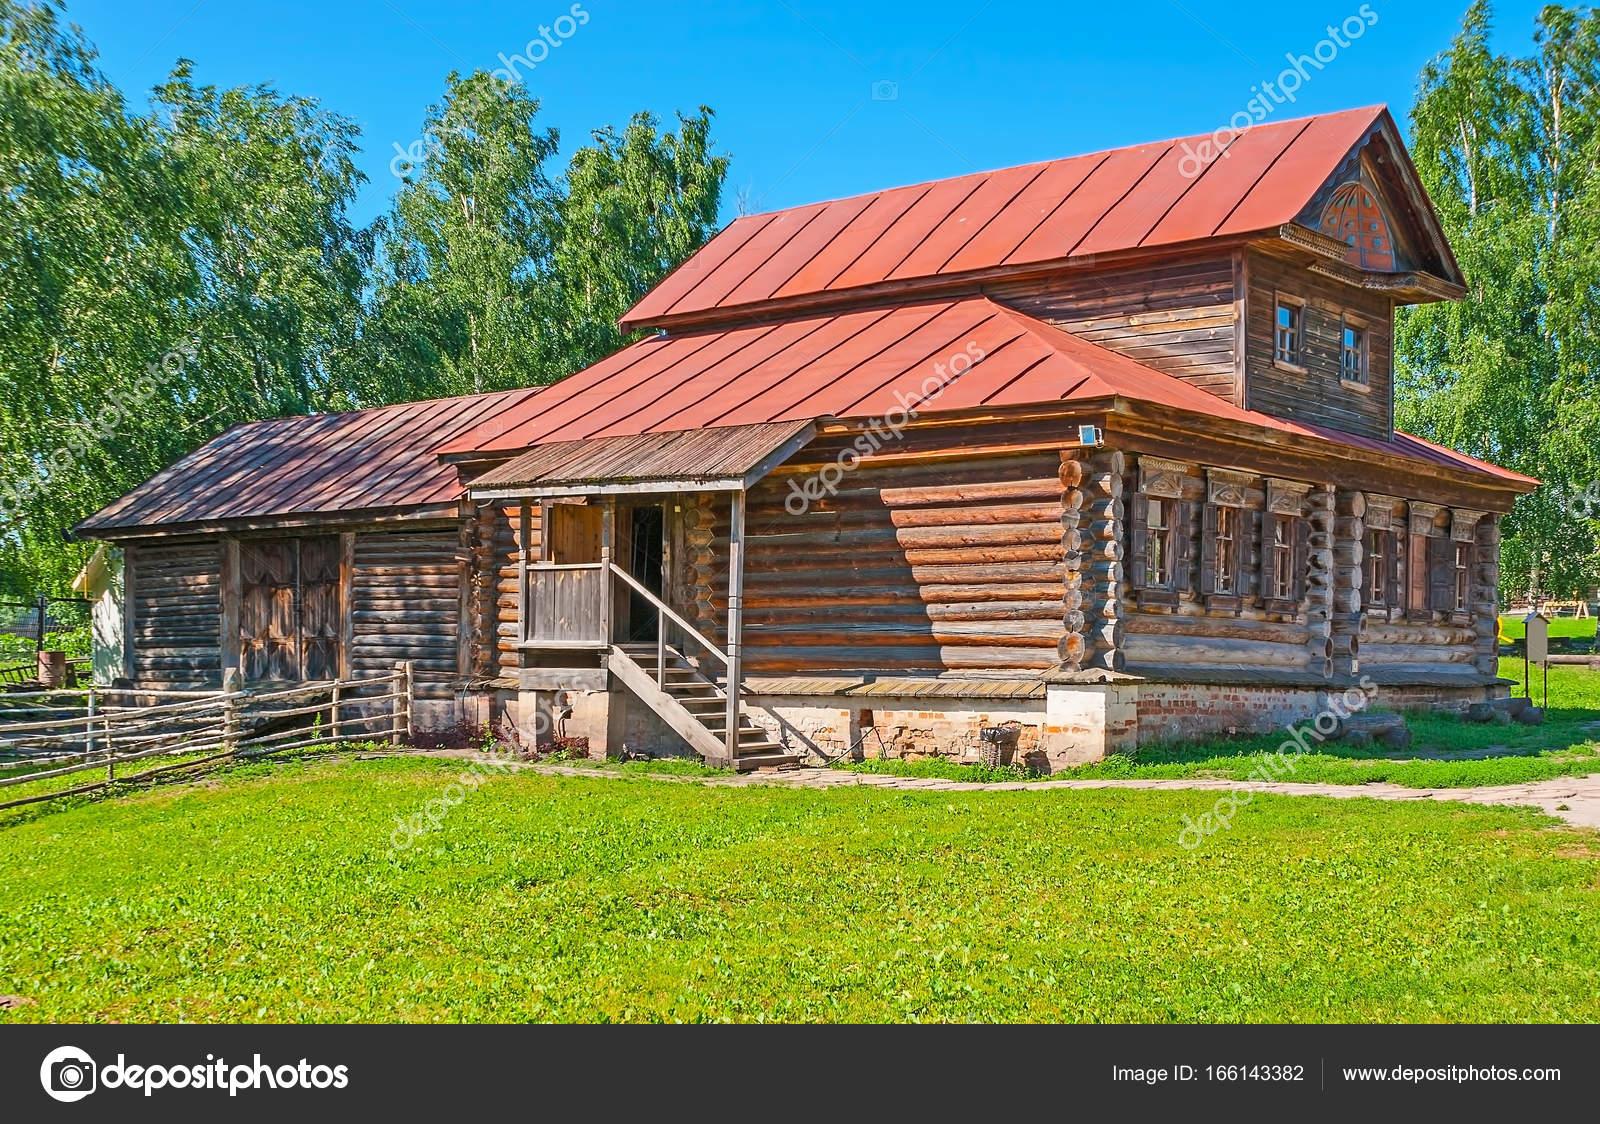 Das Blockhaus das blockhaus in susdal stockfoto efesenko 166143382